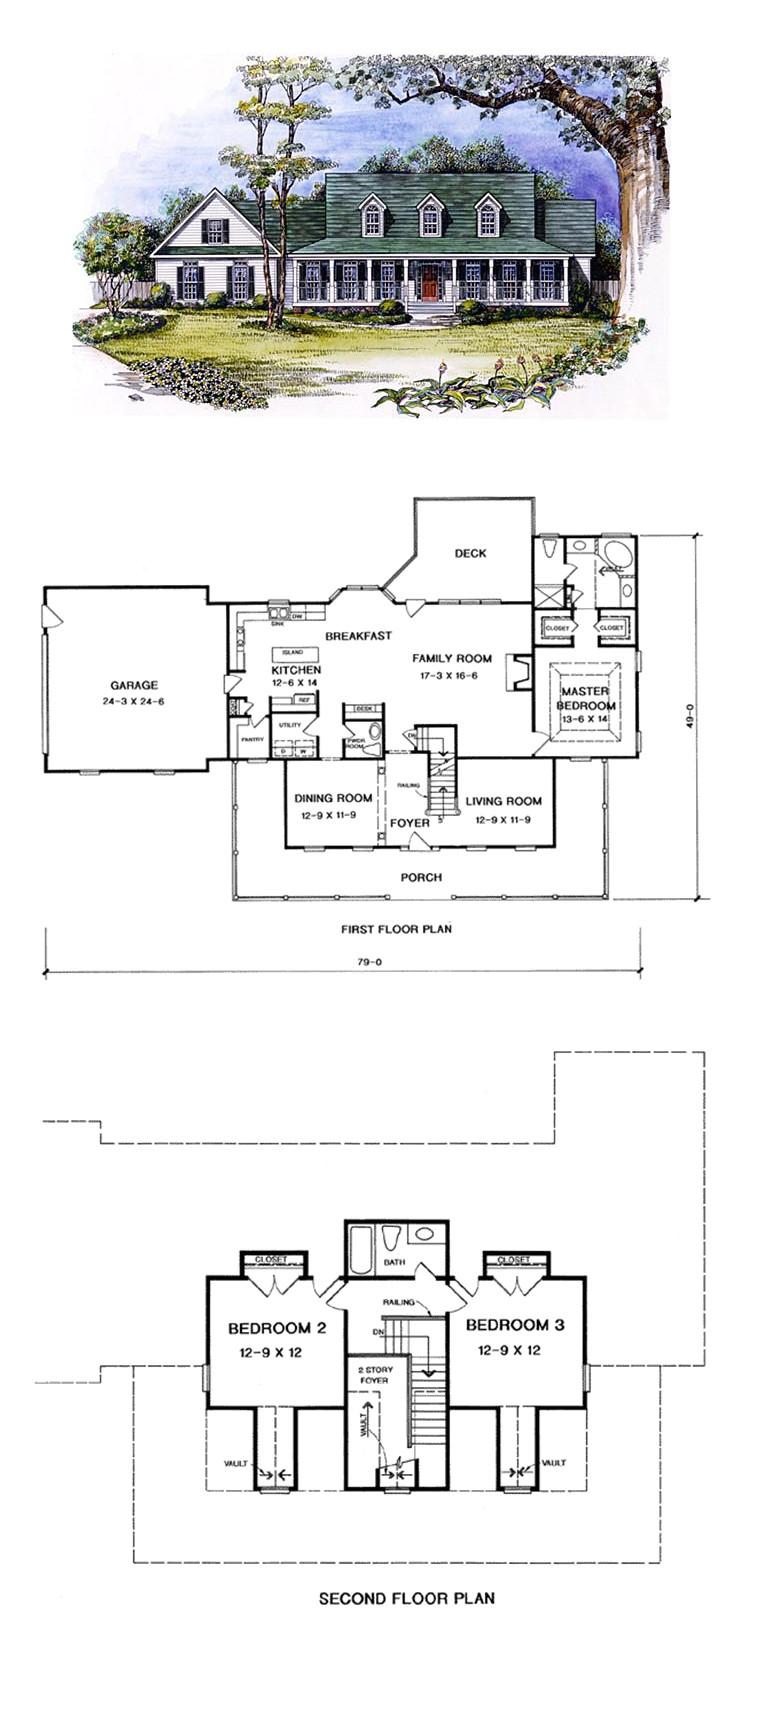 karsten homes floor plans beautiful sunshine mobile homes floor plans pole barn home floor plans of